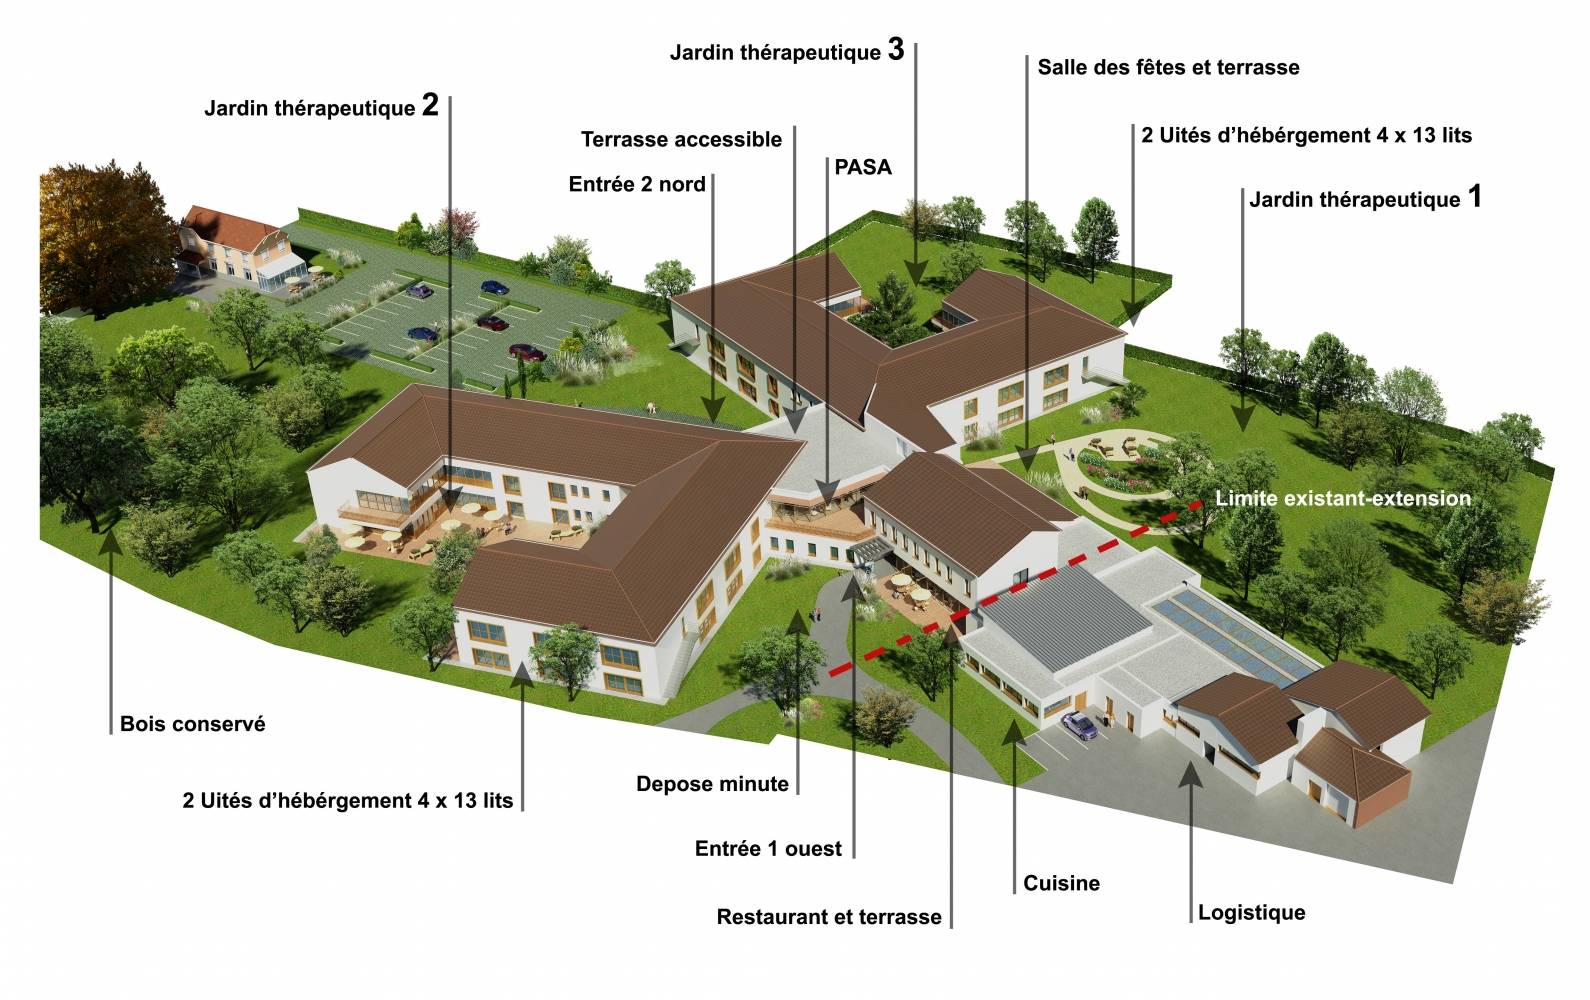 01-st-germain-img-002 Pascale SEURIN Architecte - Médico-Social